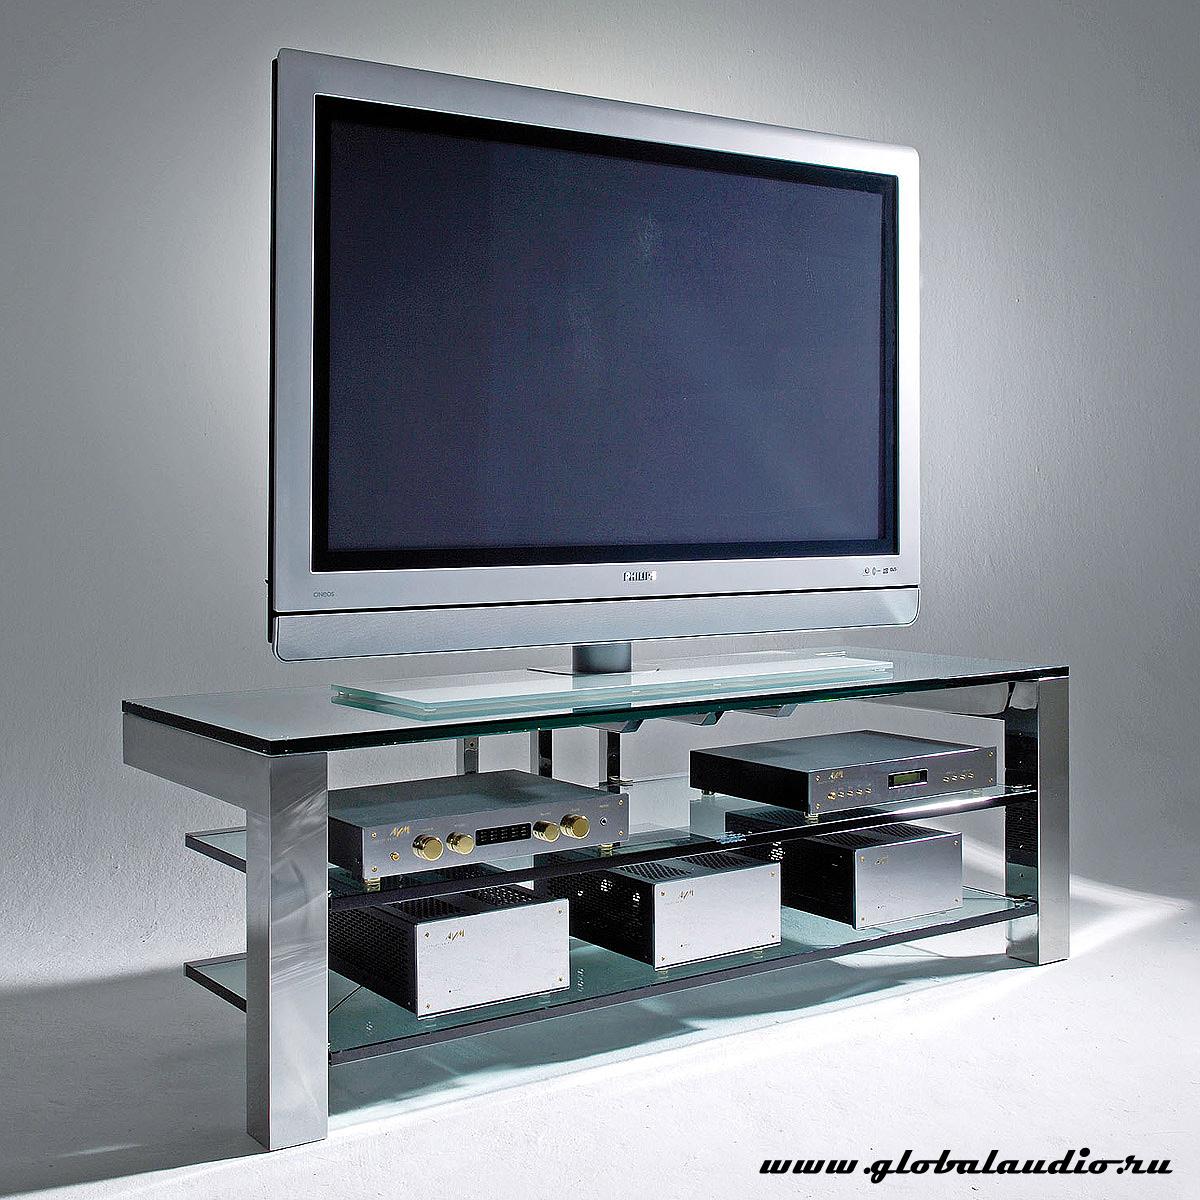 schroers schroers focus e150 globalaudio. Black Bedroom Furniture Sets. Home Design Ideas